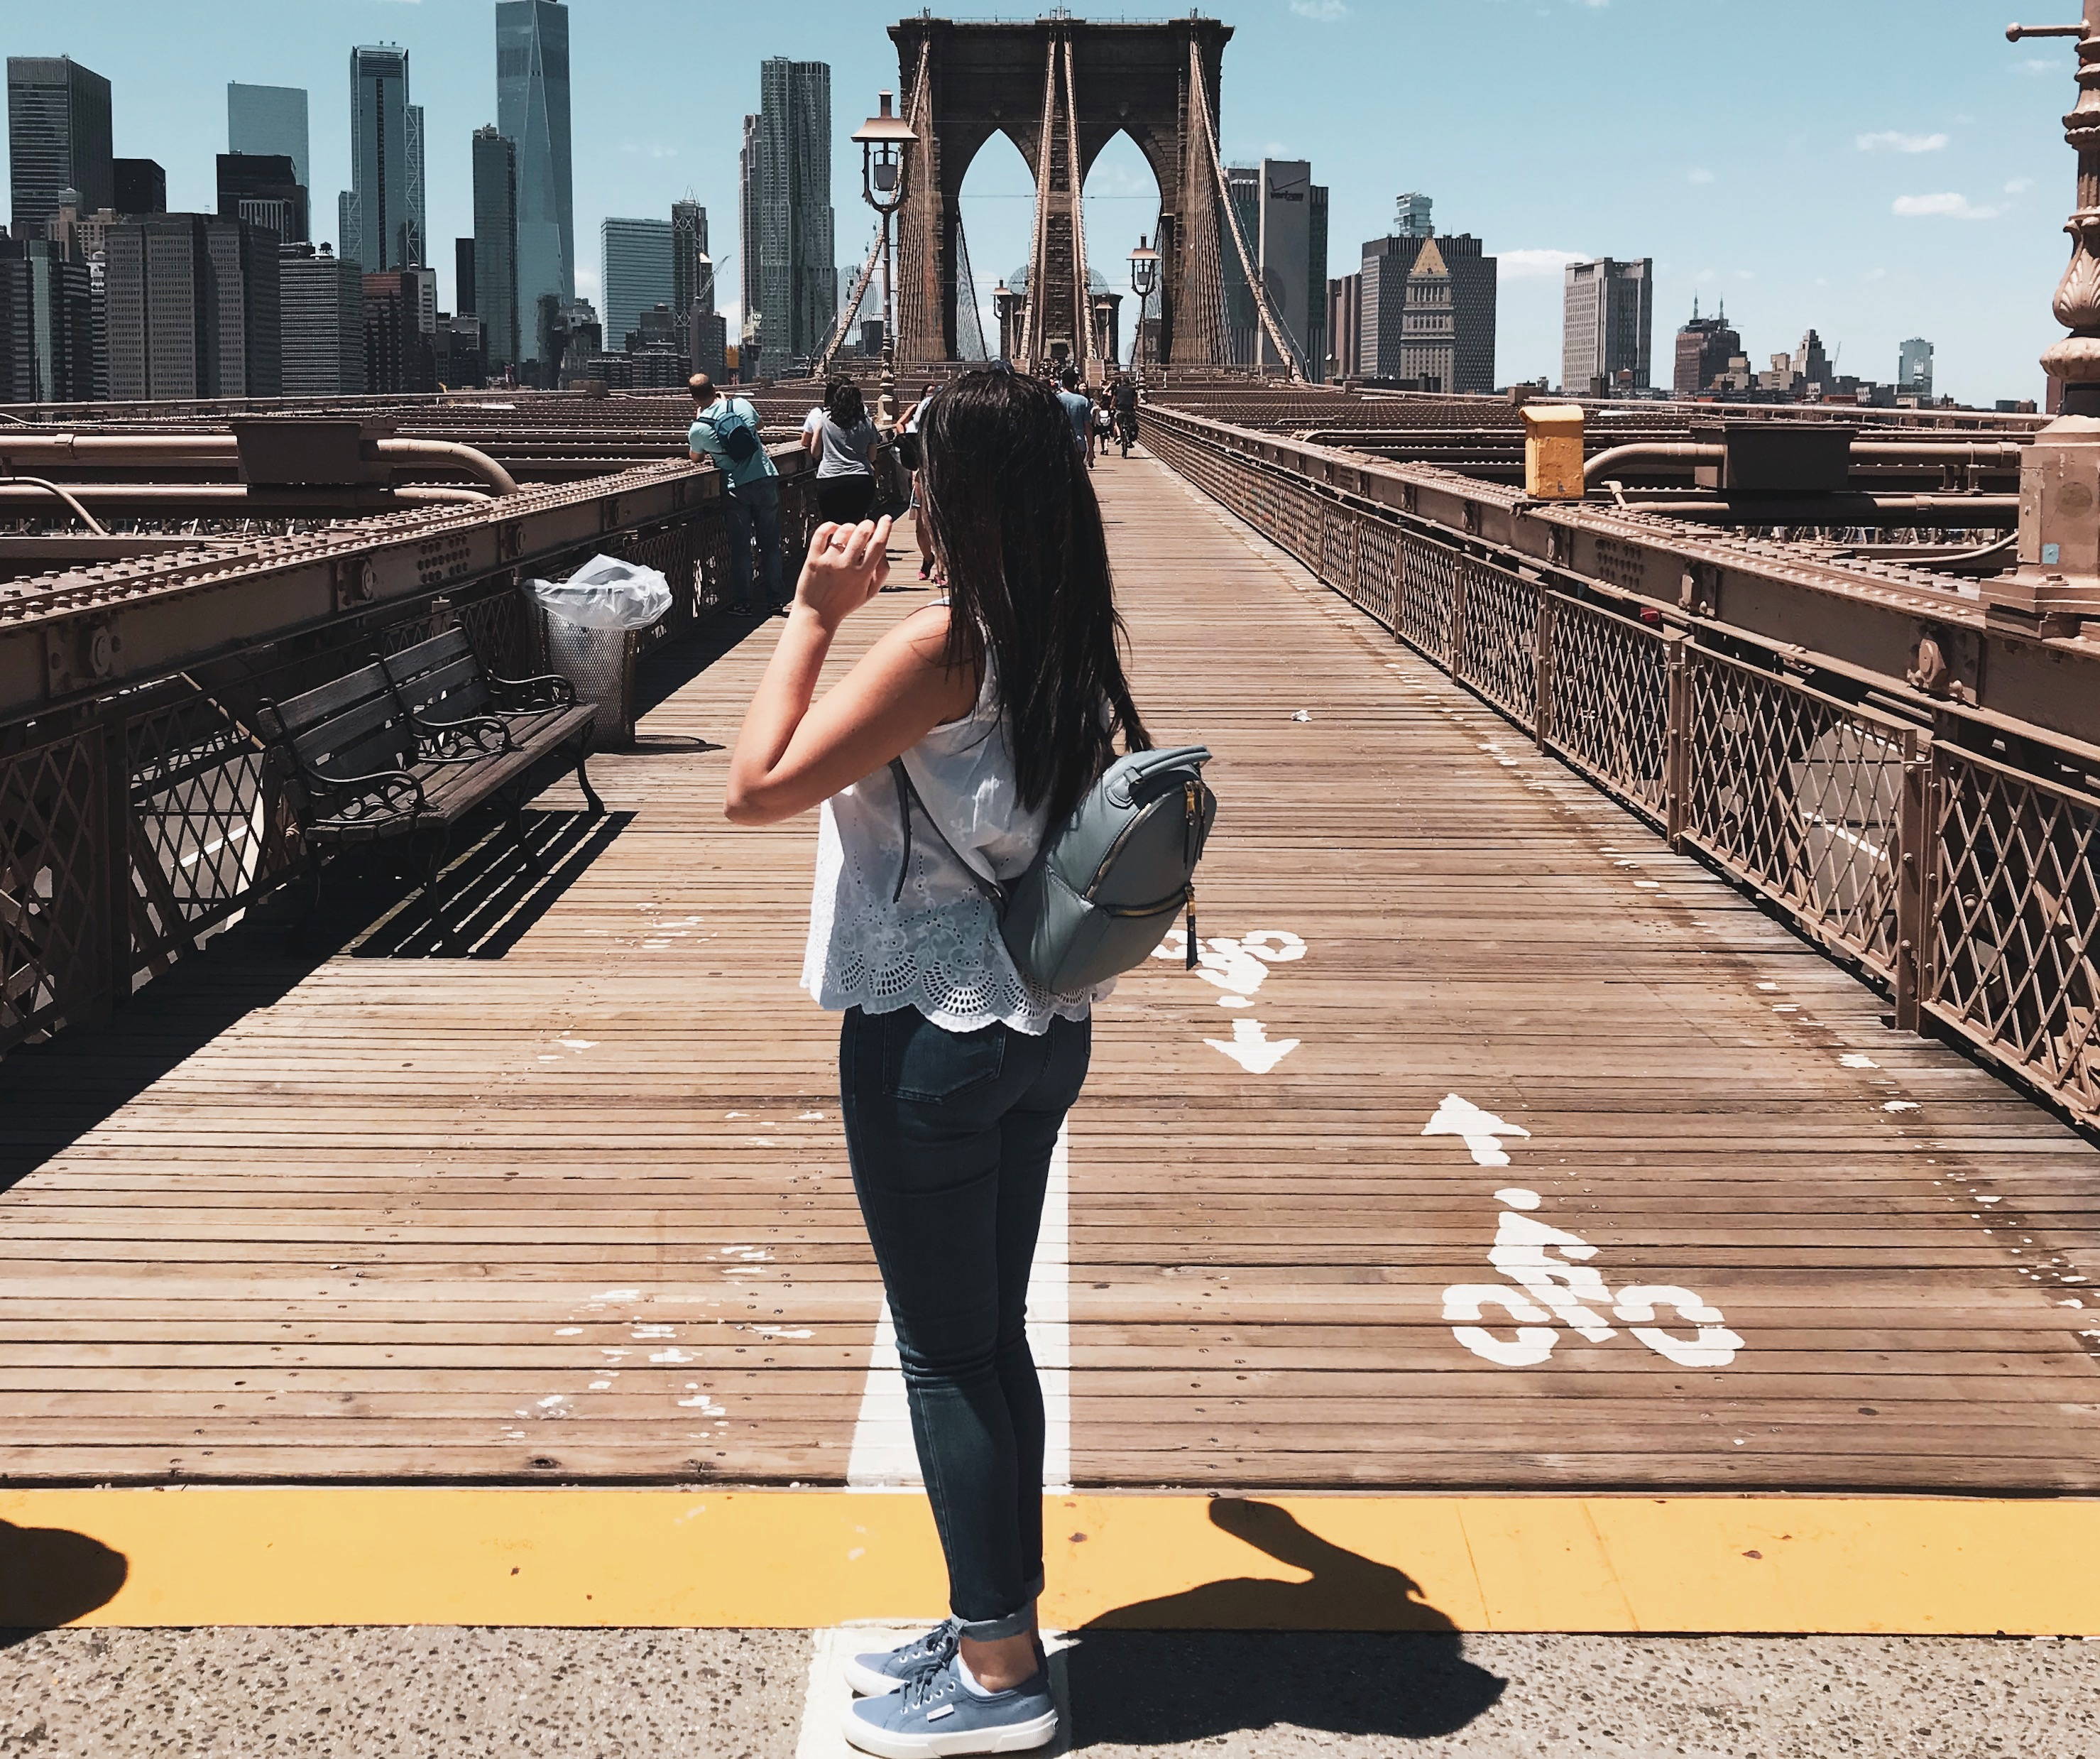 viaggio-a-new-york-manhattan-ponte-di-brooklyn